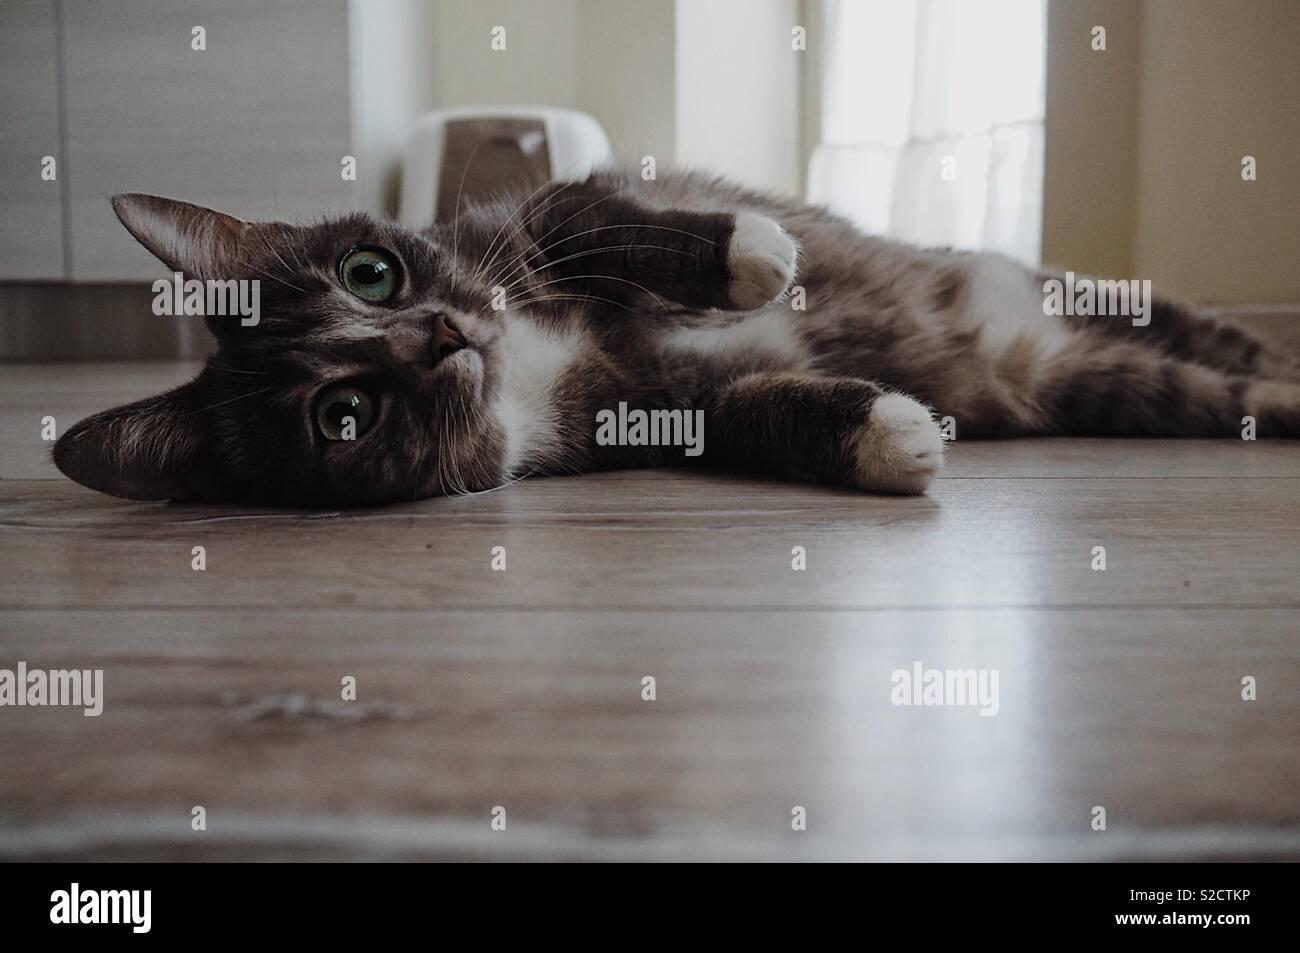 Gato tumbado Imagen De Stock